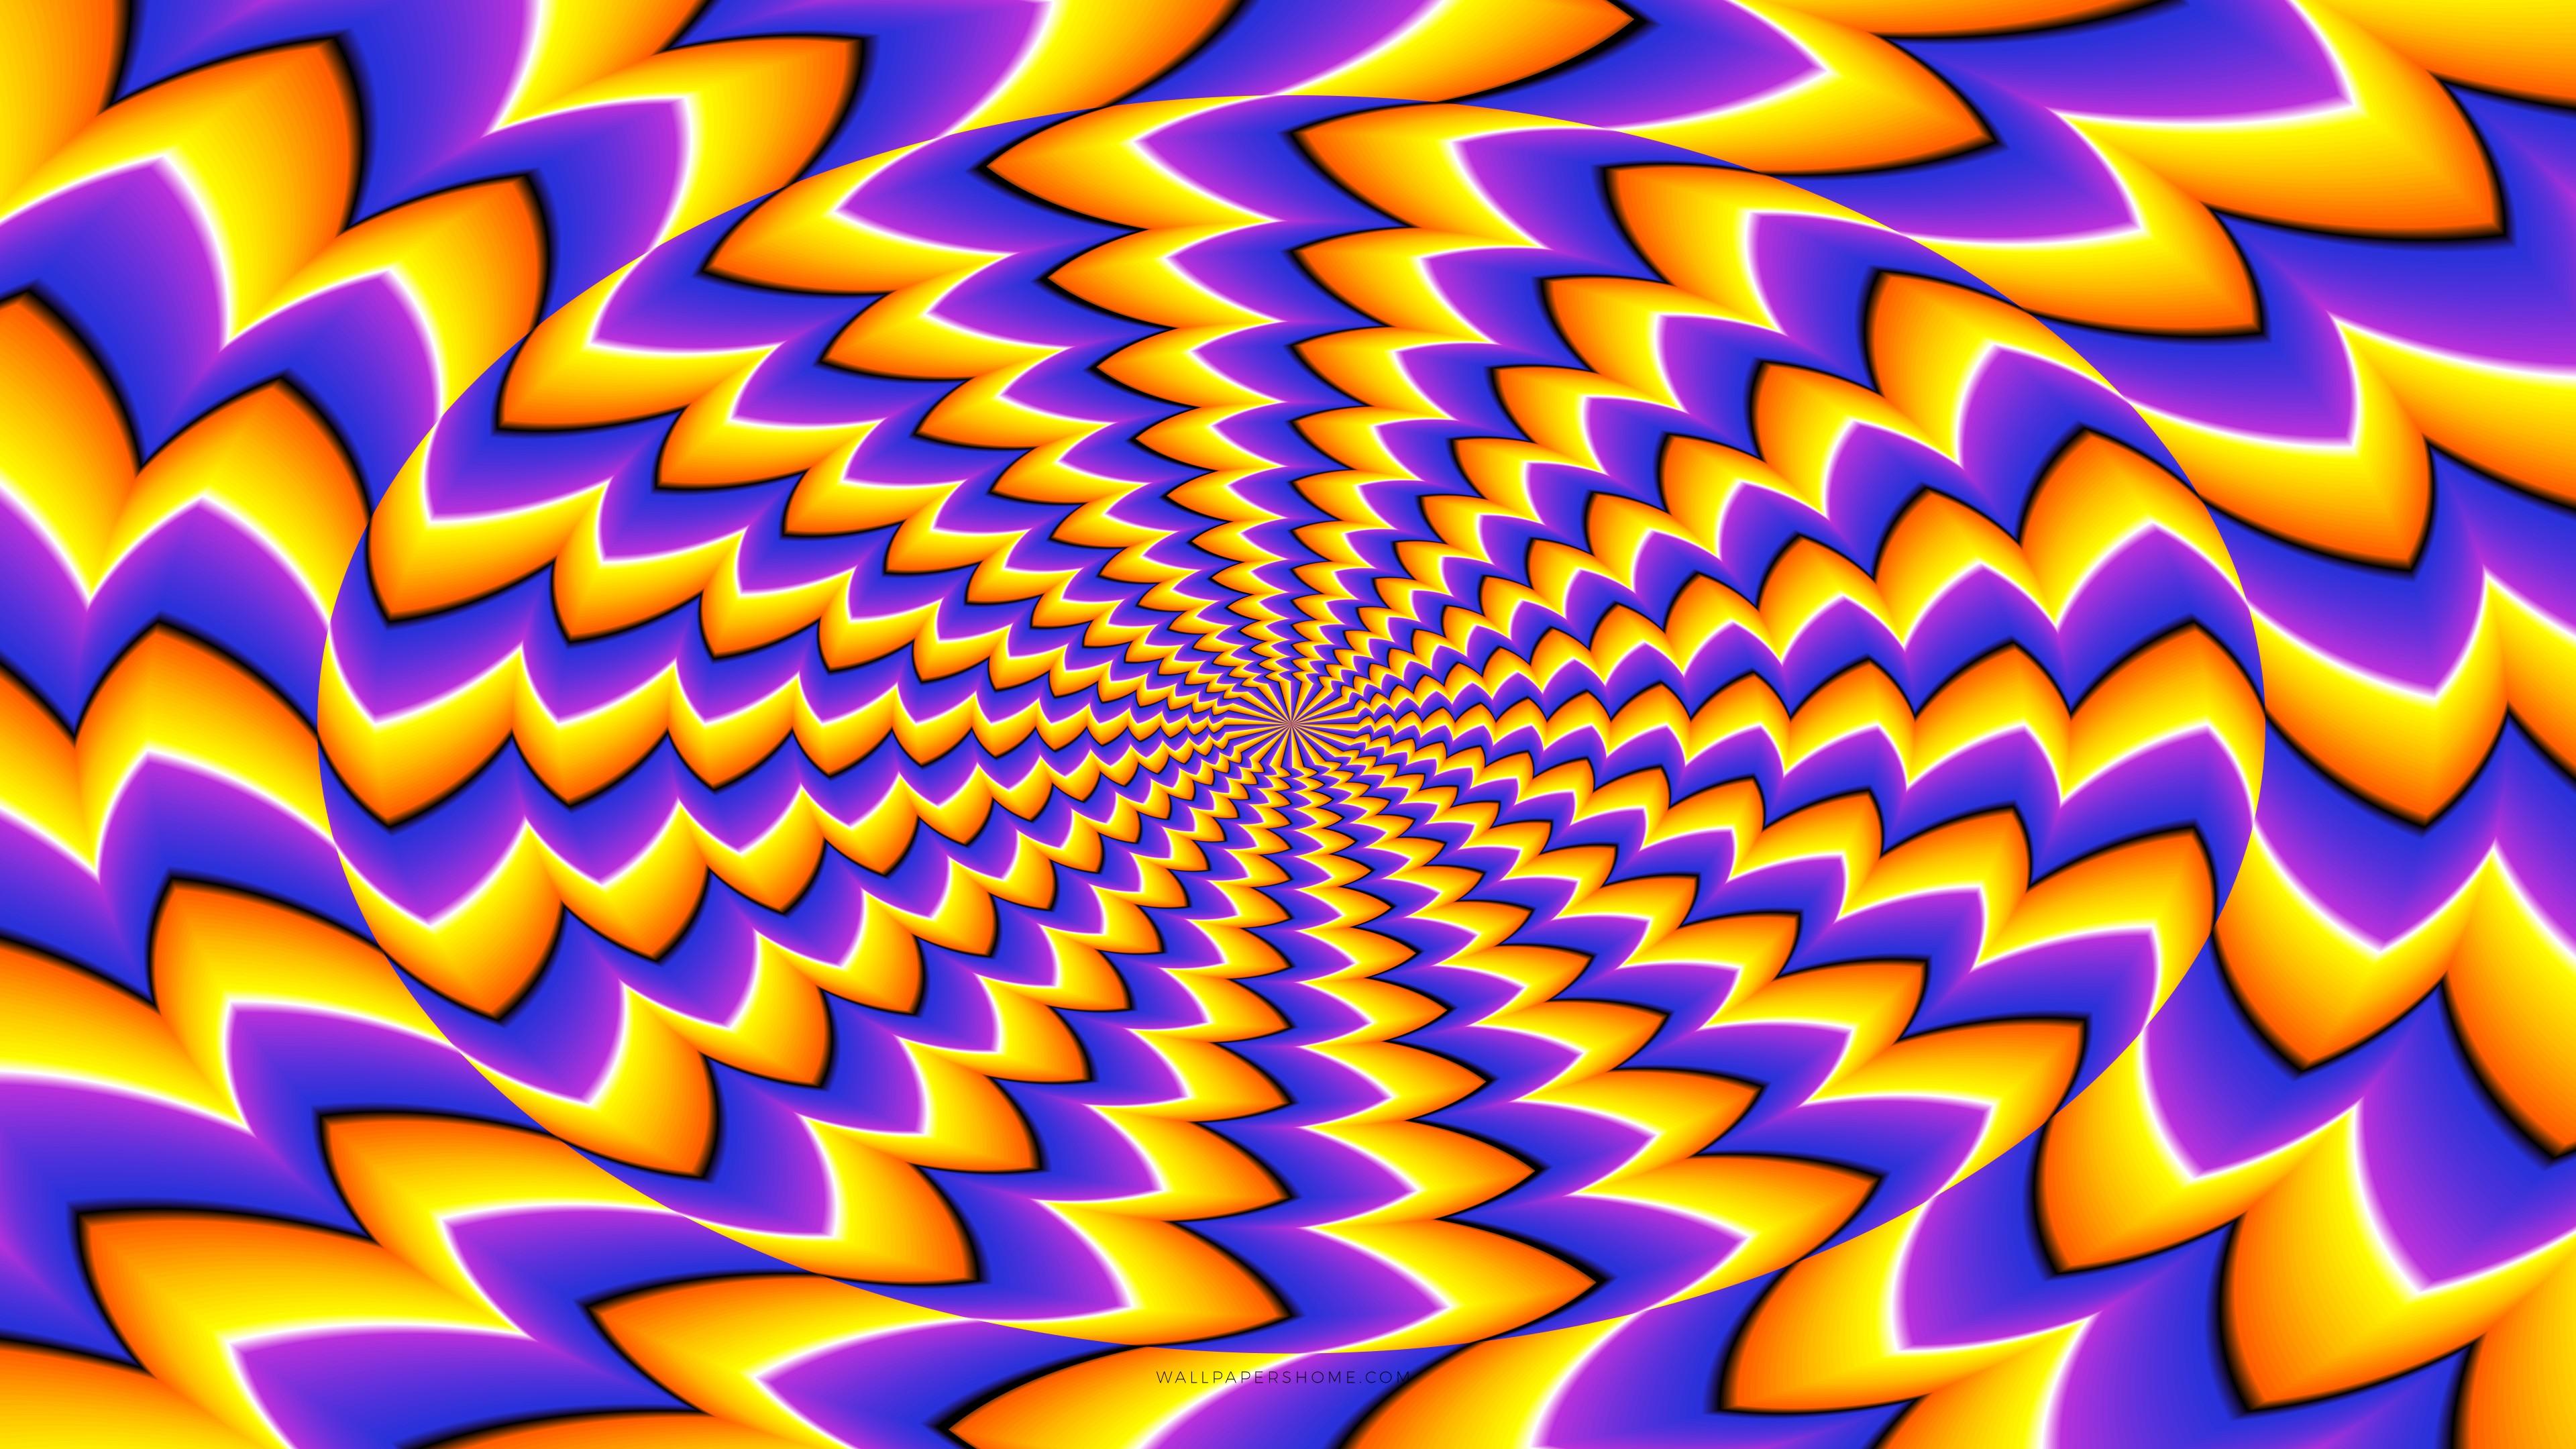 Wallpaper Optical Illusion 8k Abstract 21477